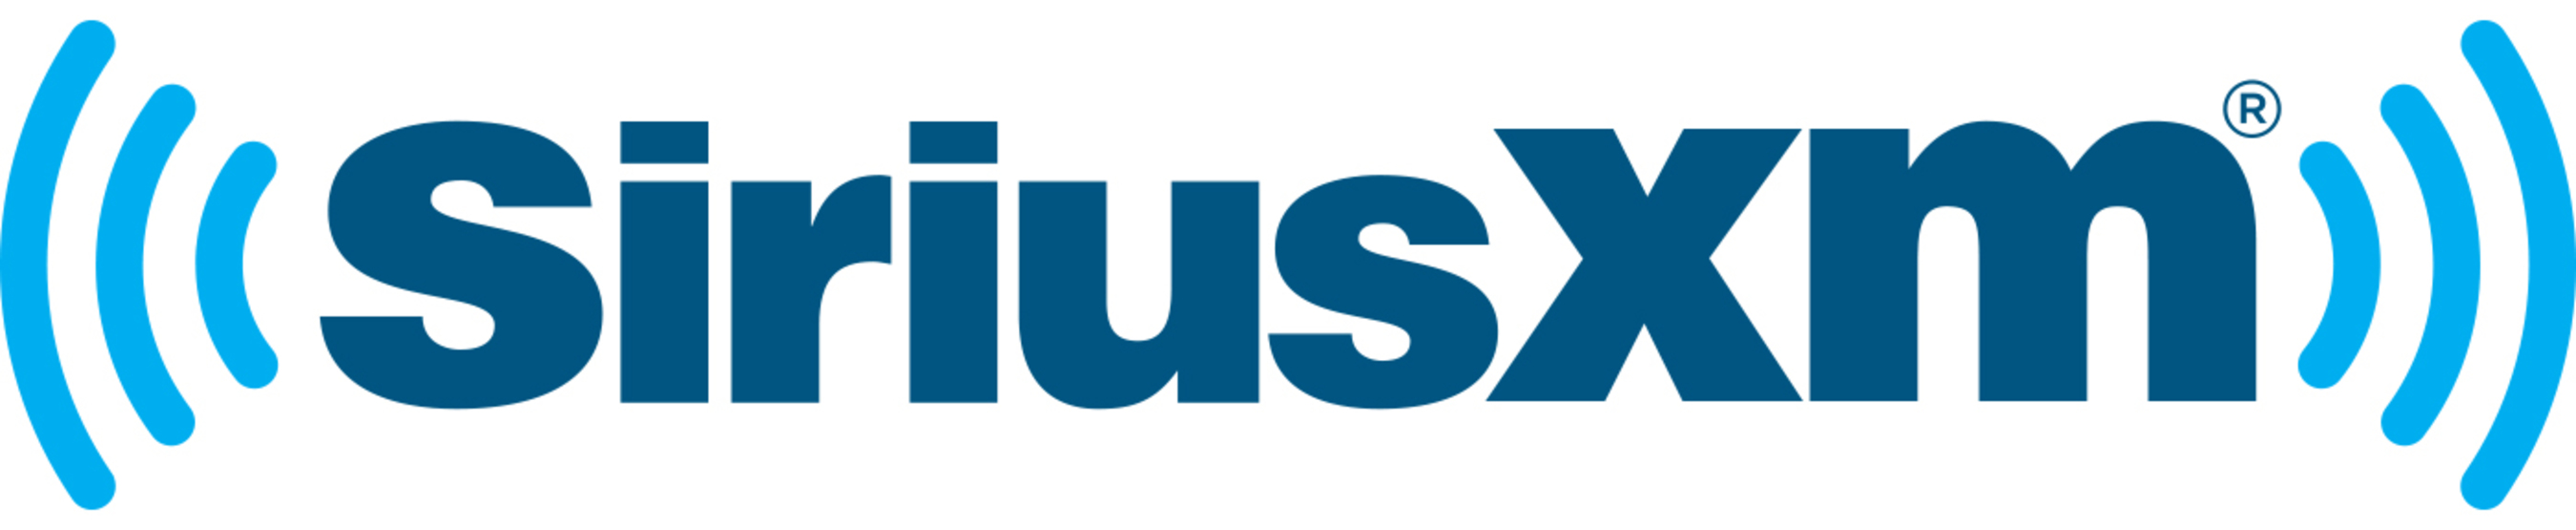 SIRIUS XM logo.